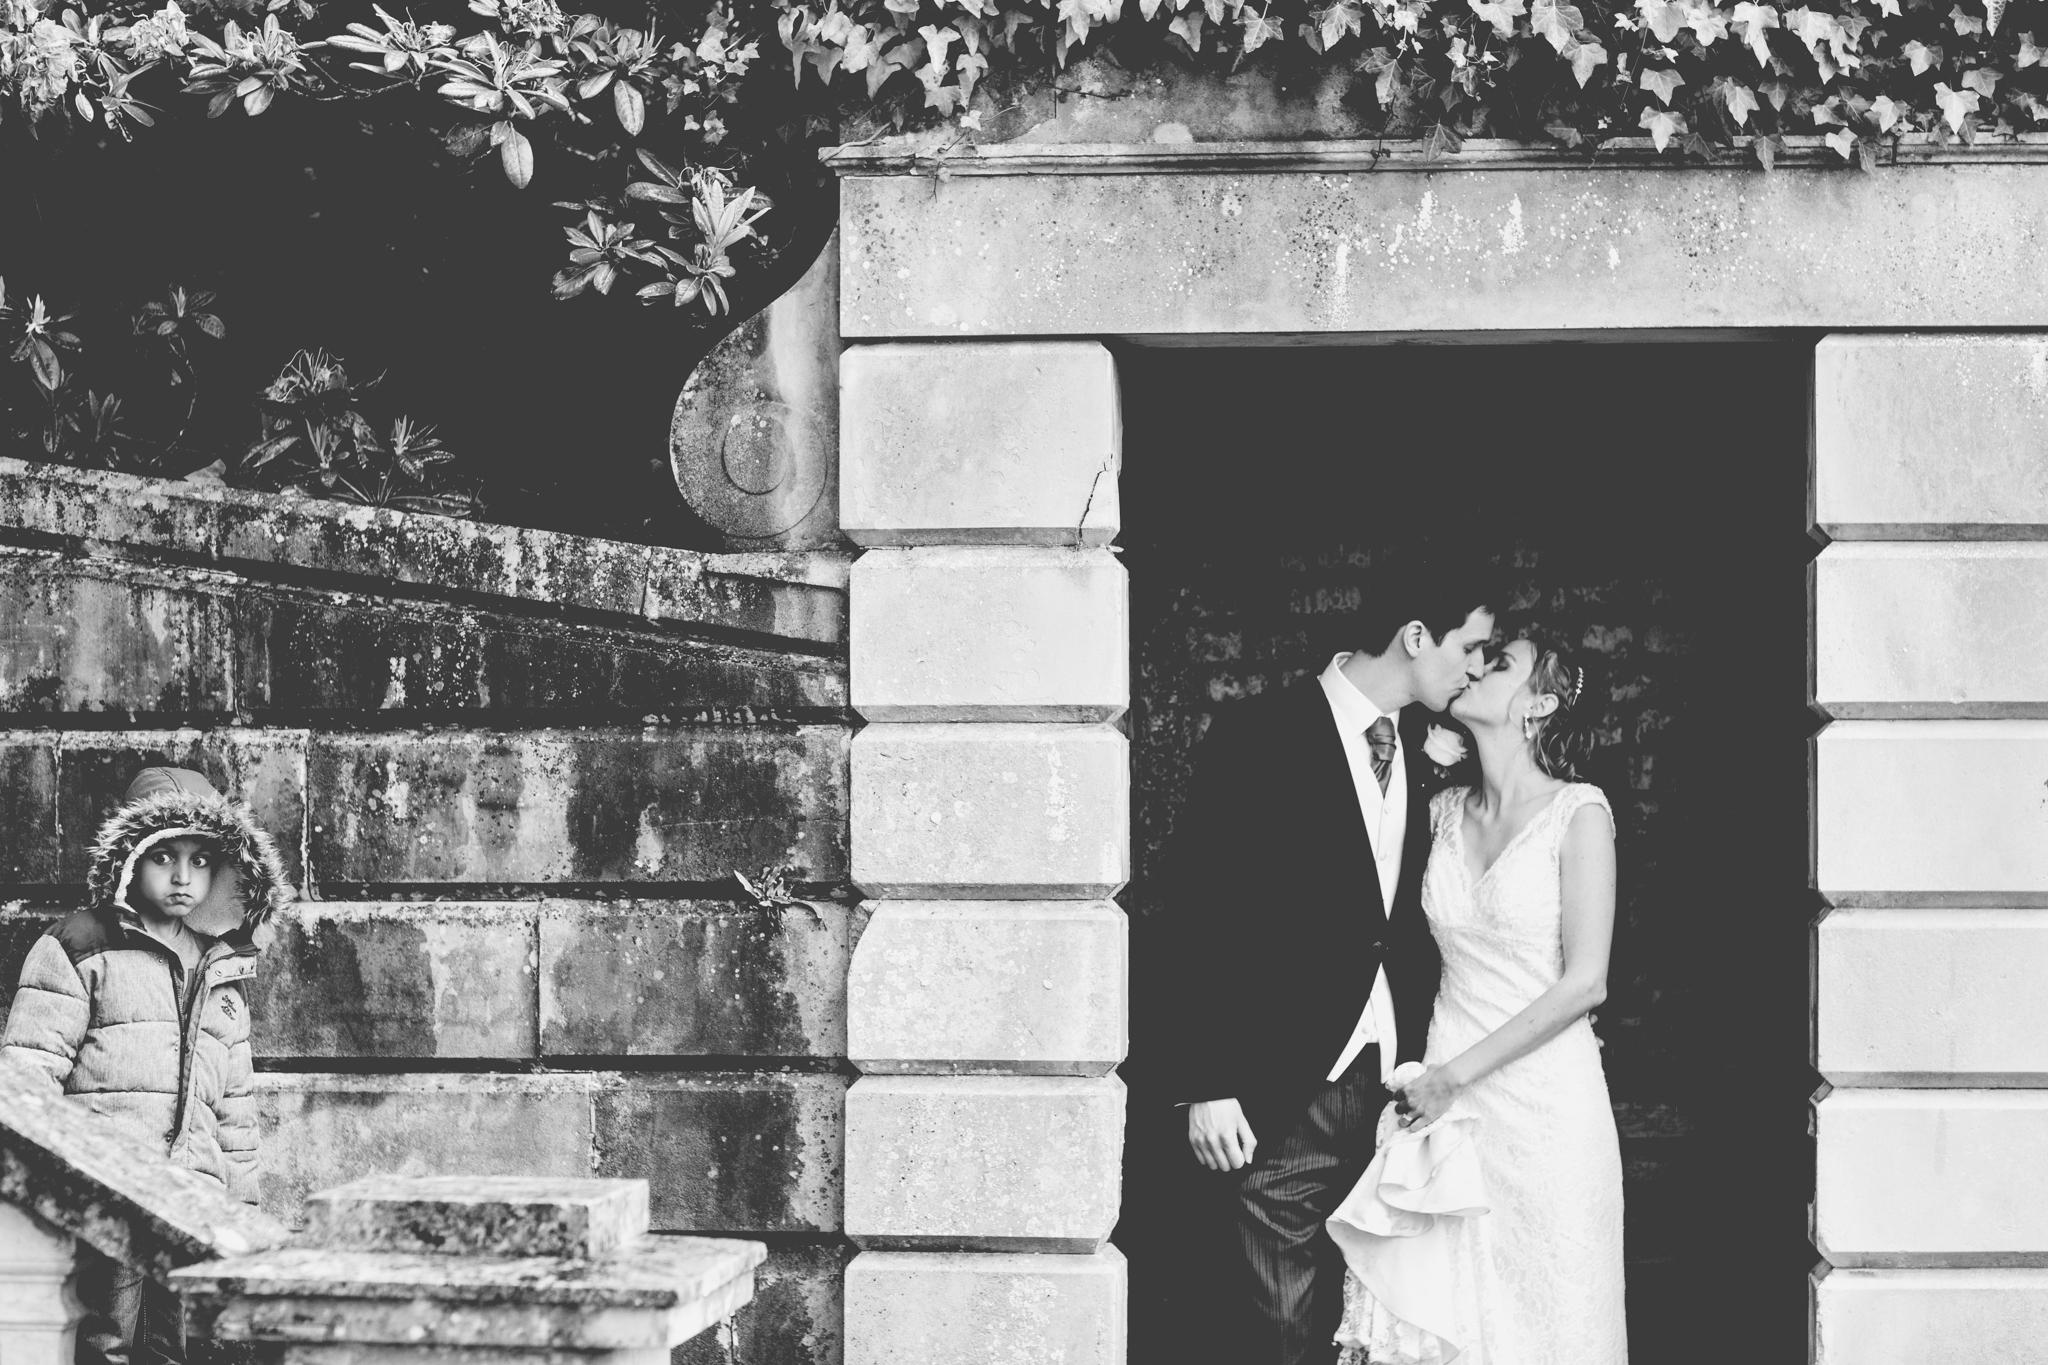 Devon wedding photographer Amy Sampson | Megan and Dan | University of Exeter